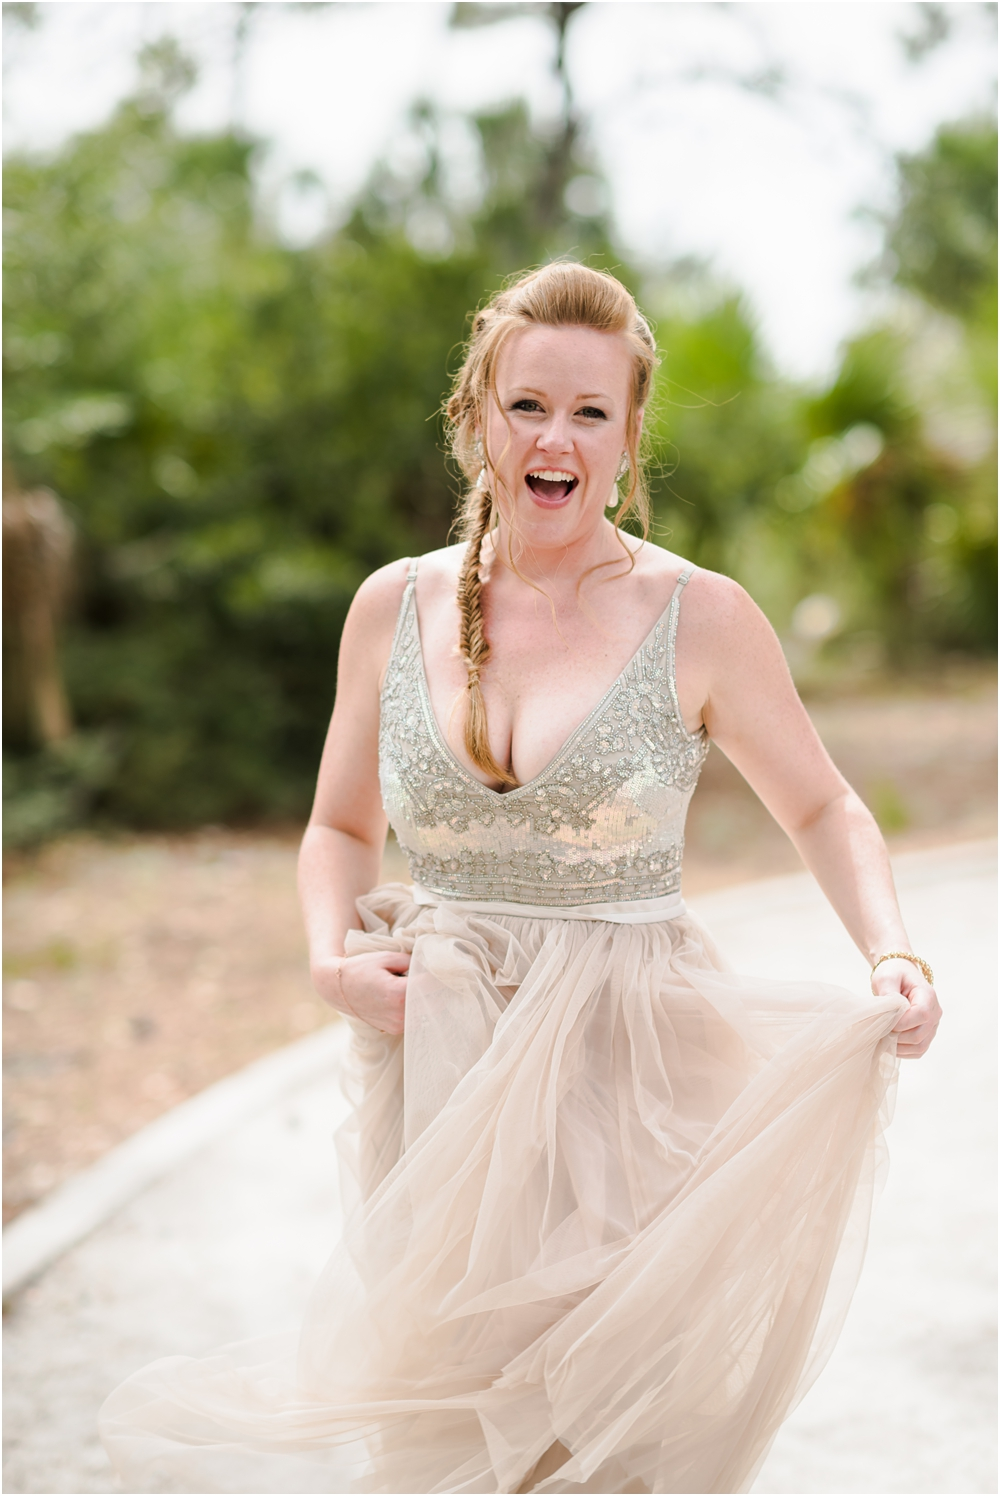 st-joe-florida-wedding-photographer-kiersten-grant-41.jpg